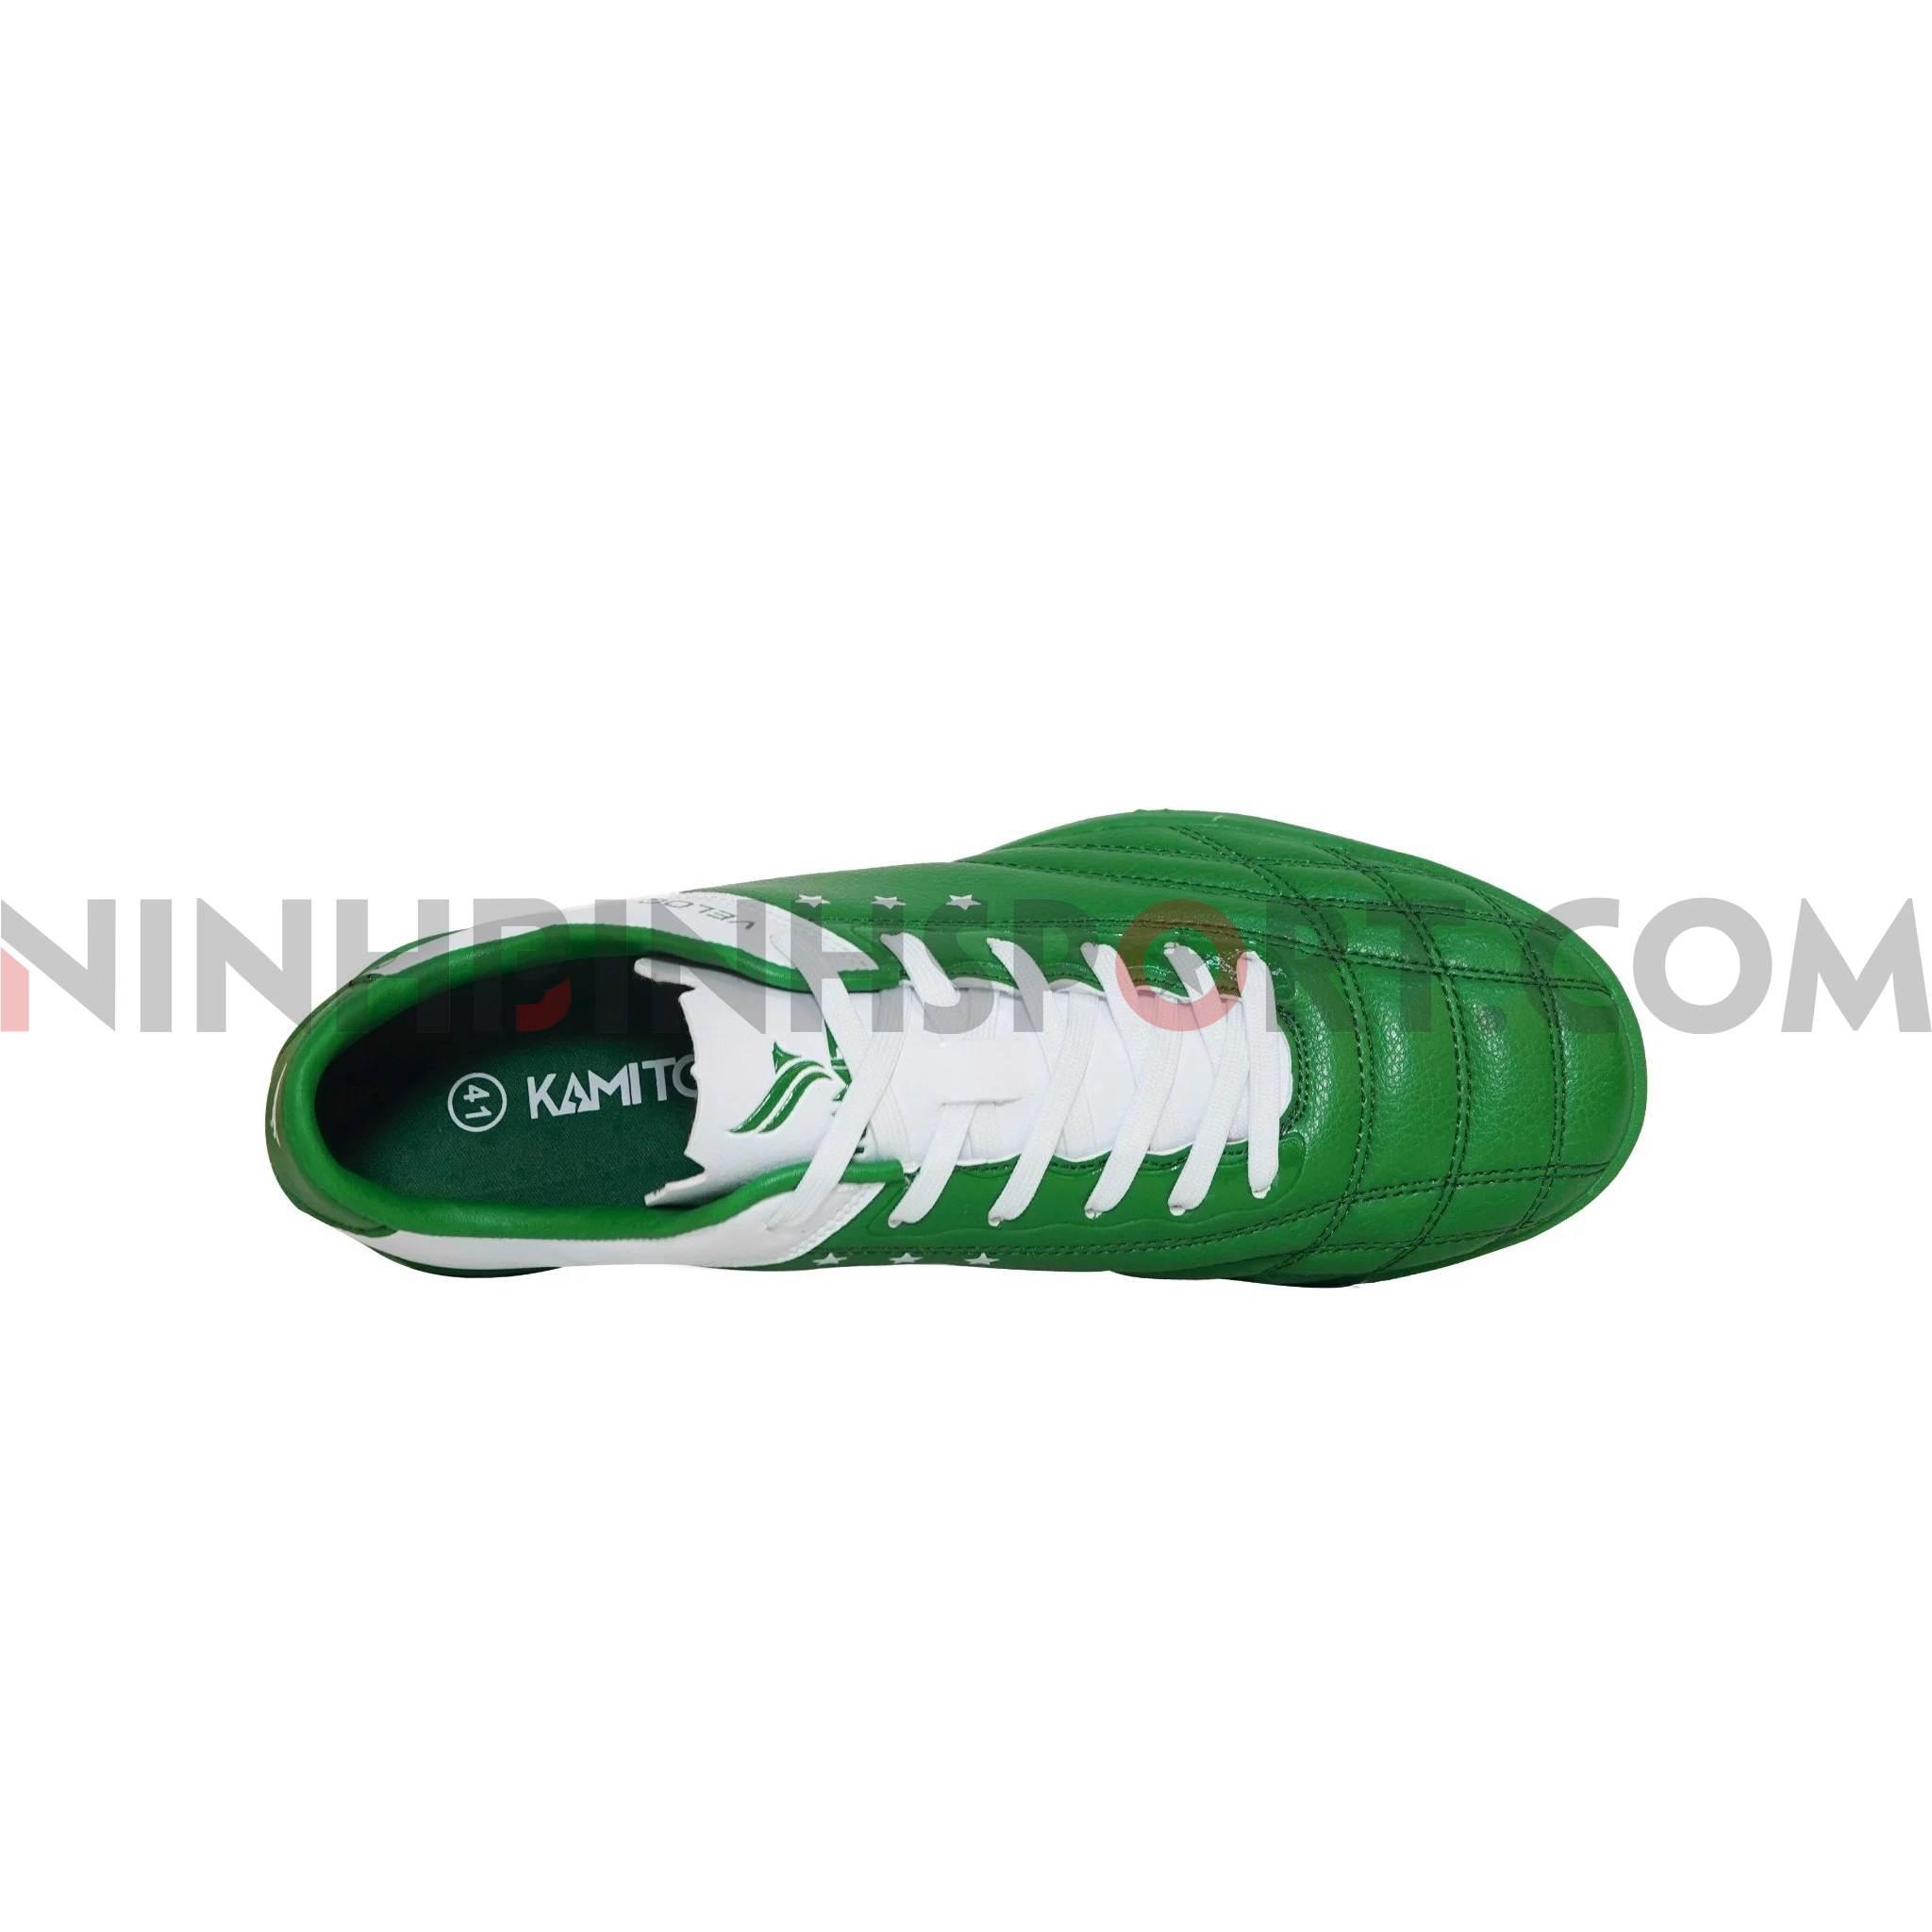 Giày bóng đá nam Kamito Velocidad 3 F19702